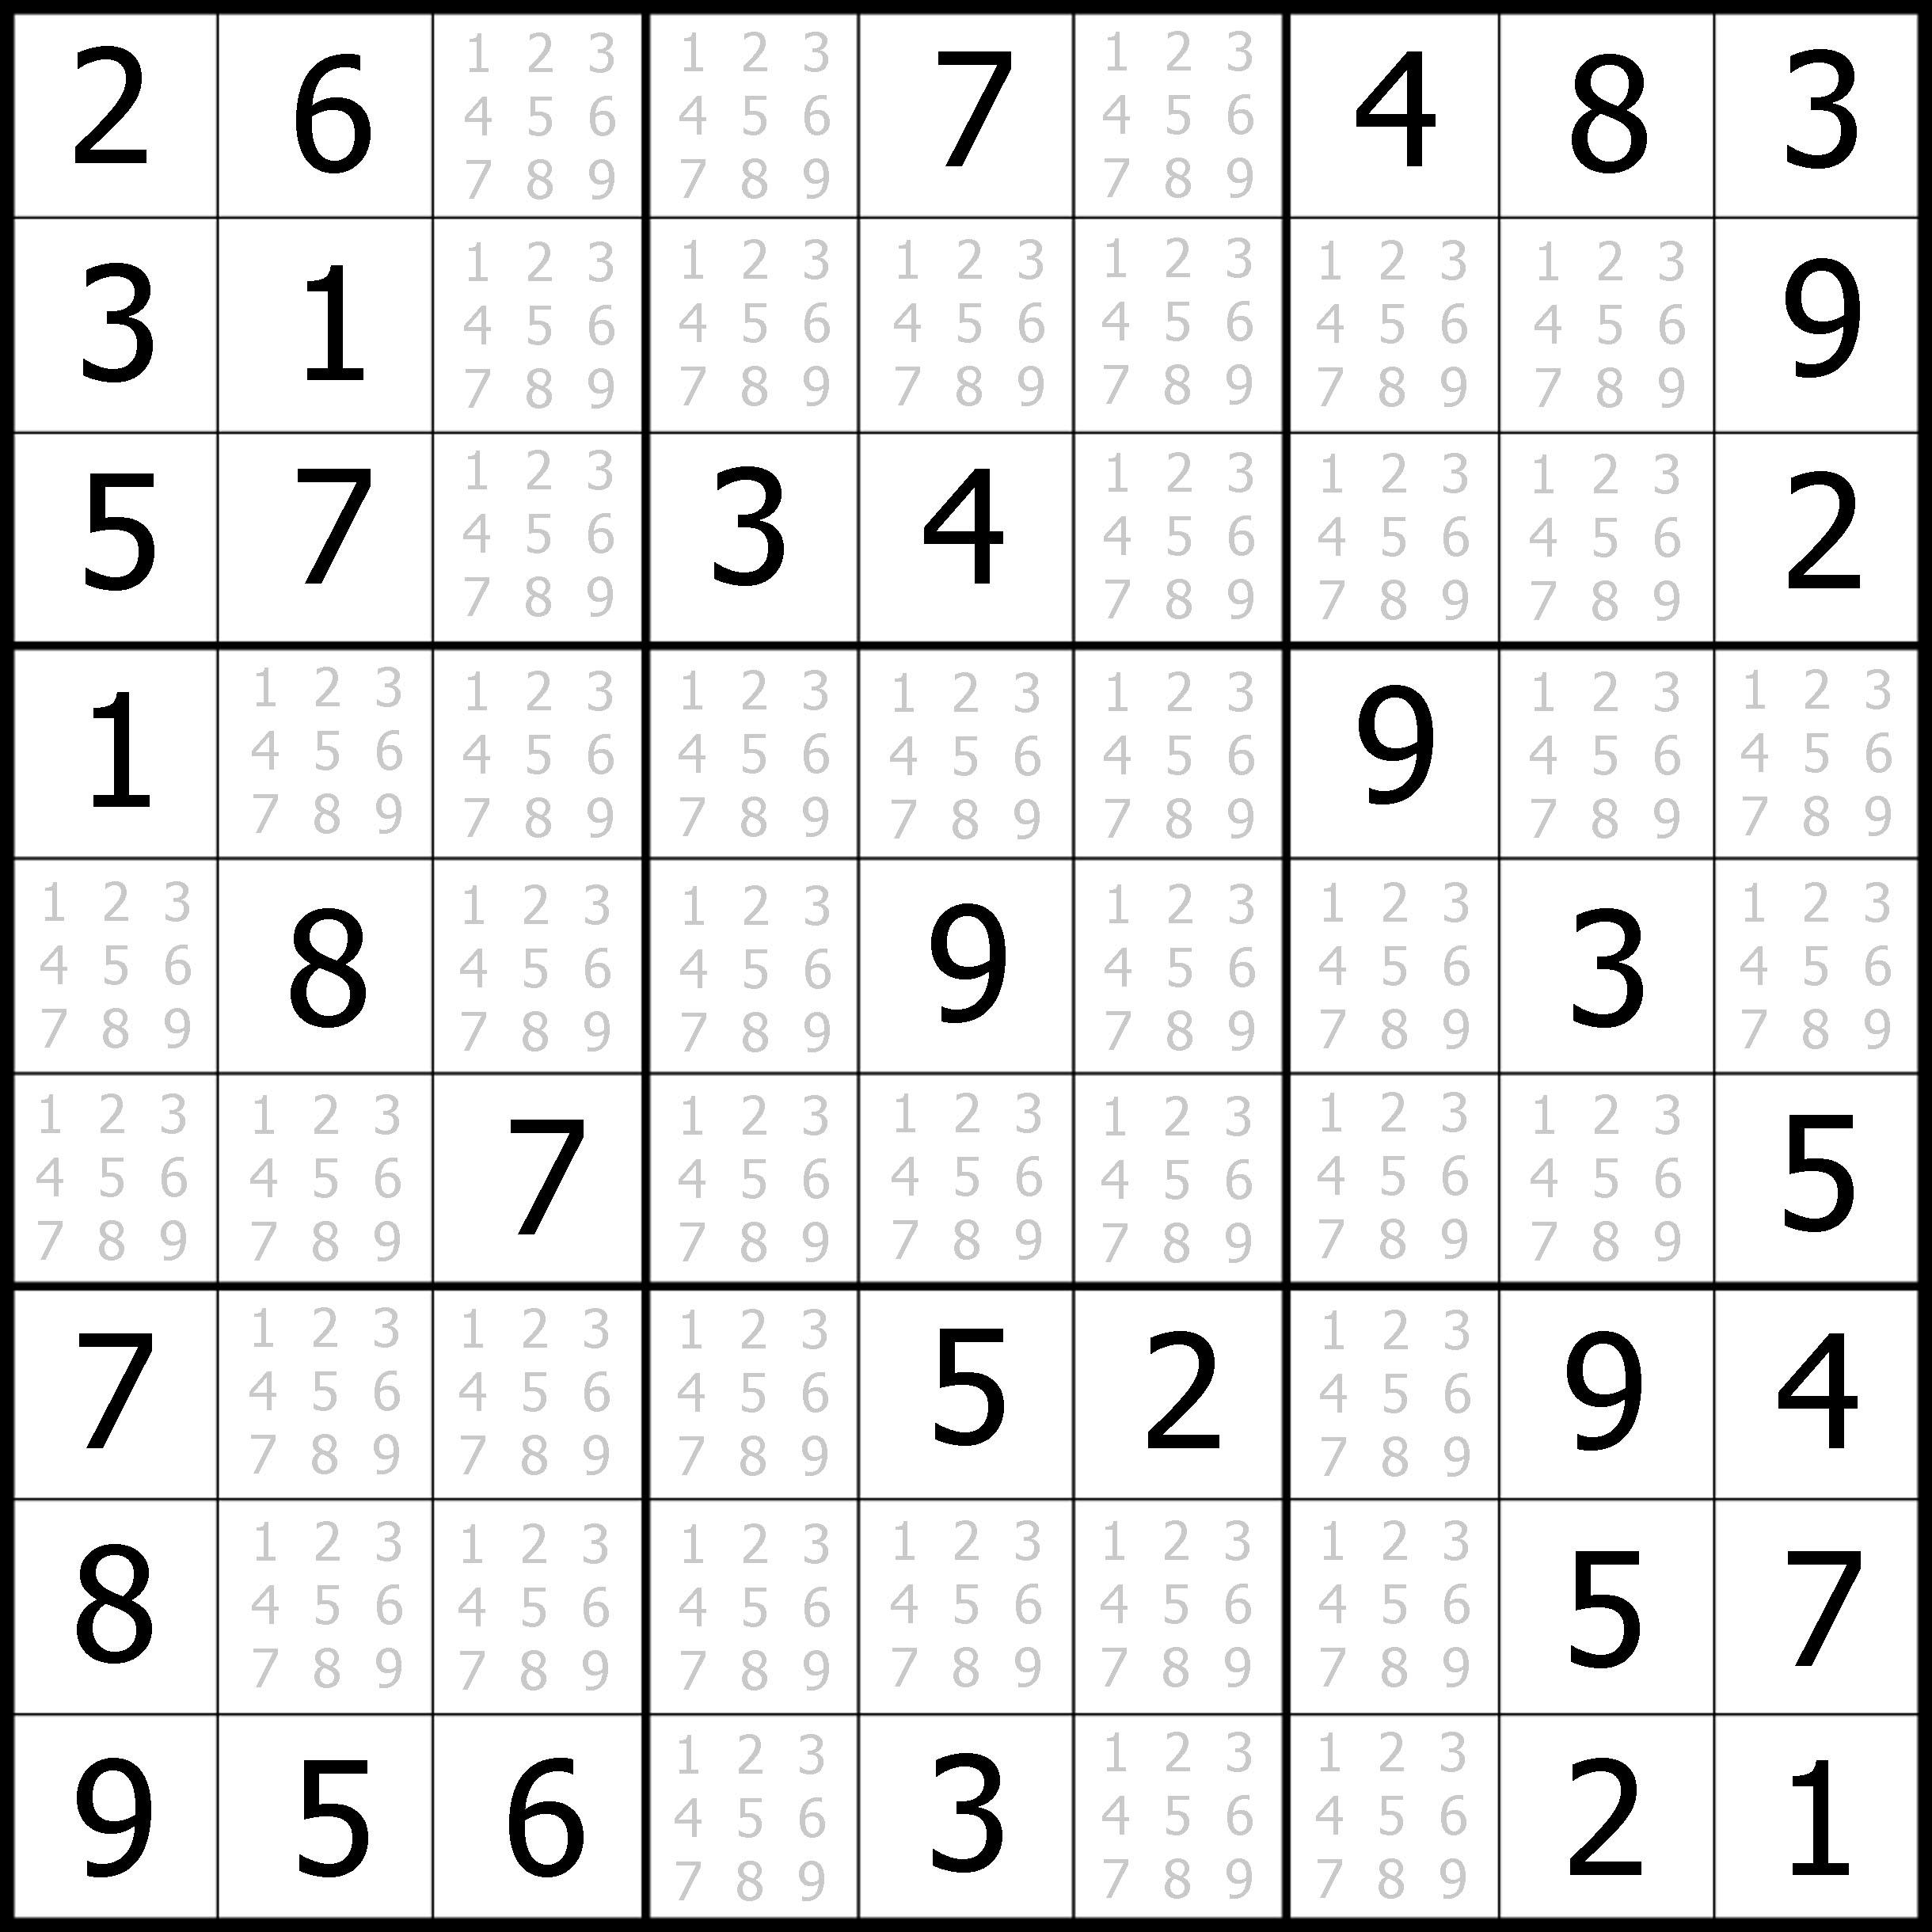 Free Easy Sudoku Puzzle #05 | Sudoku Puzzler